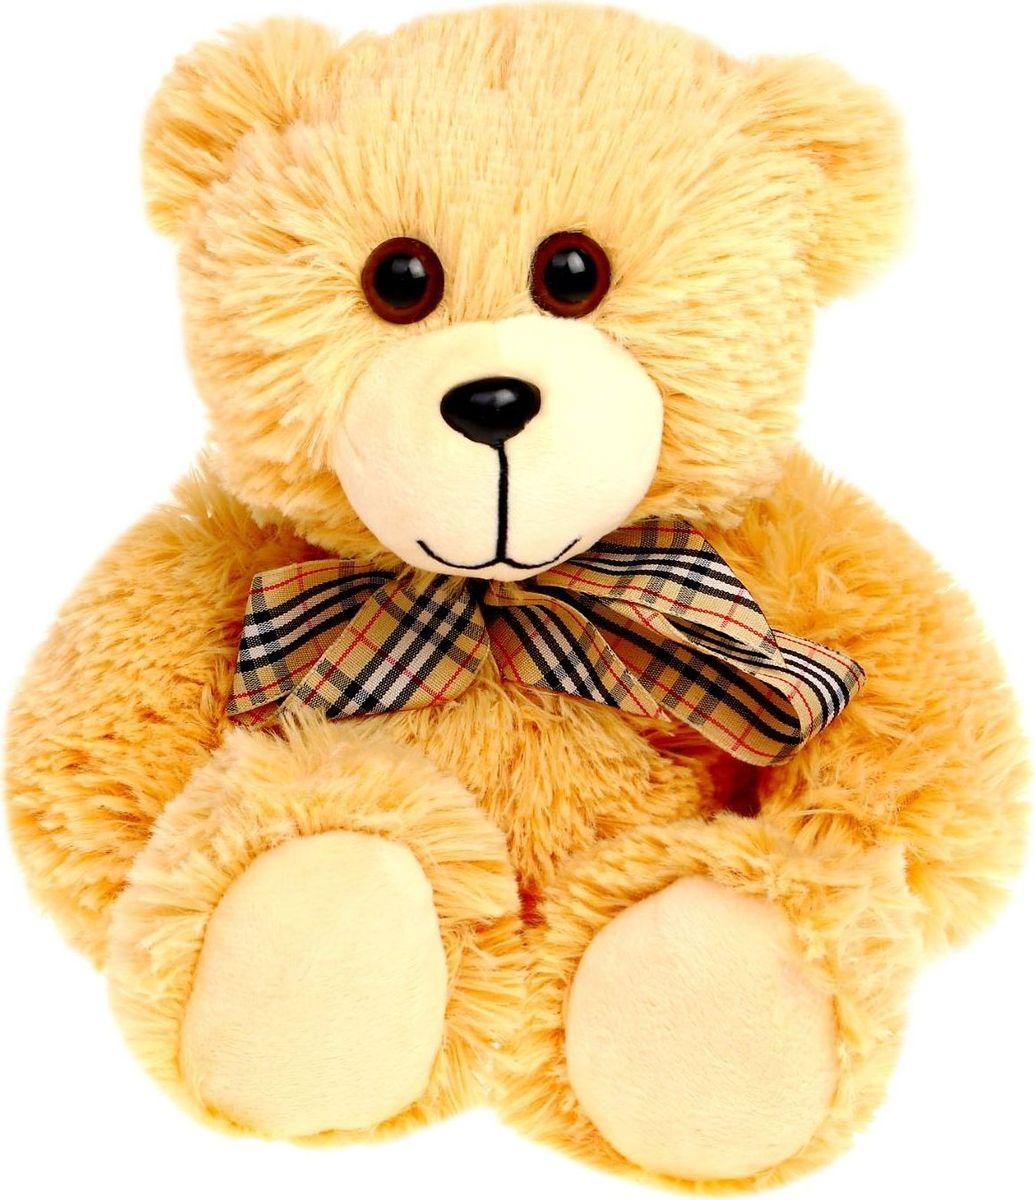 Sima-land Мягкая игрушка Медвежонок 21 см sima land мягкая игрушка ушастый зайка 17 см